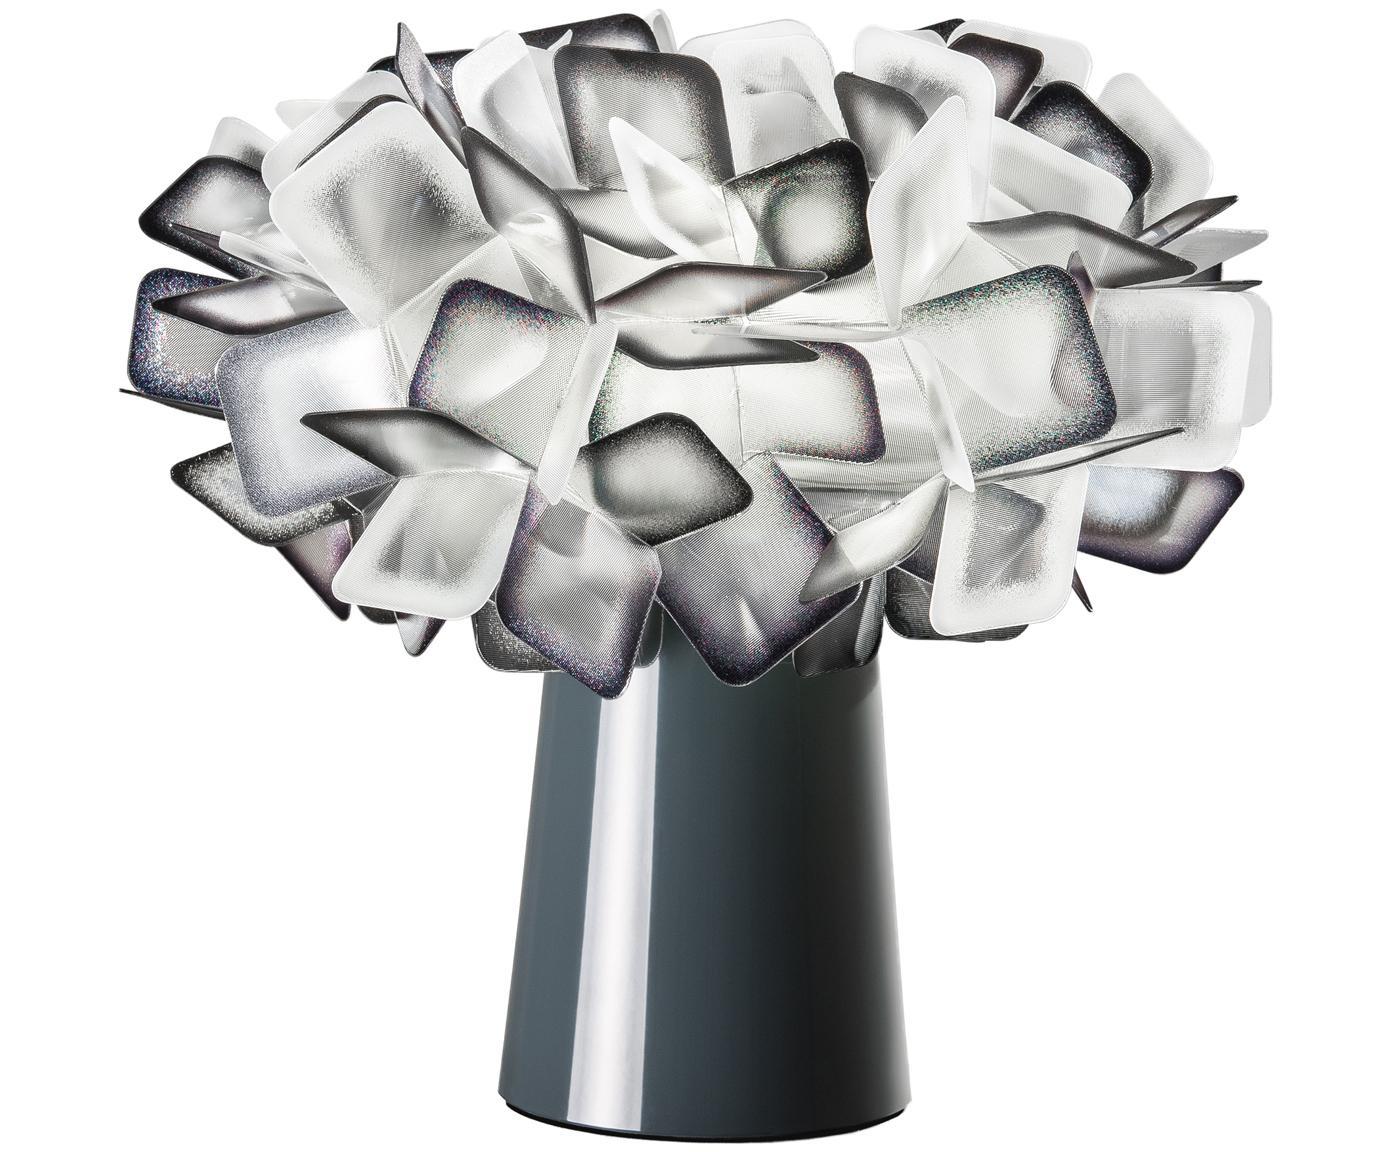 Design tafellamp Clizia, Lampenkap: technopolymeer Lentiflex®, Lampvoet: gecoat staal, Transparant, zwart, Ø 27 x H 25 cm